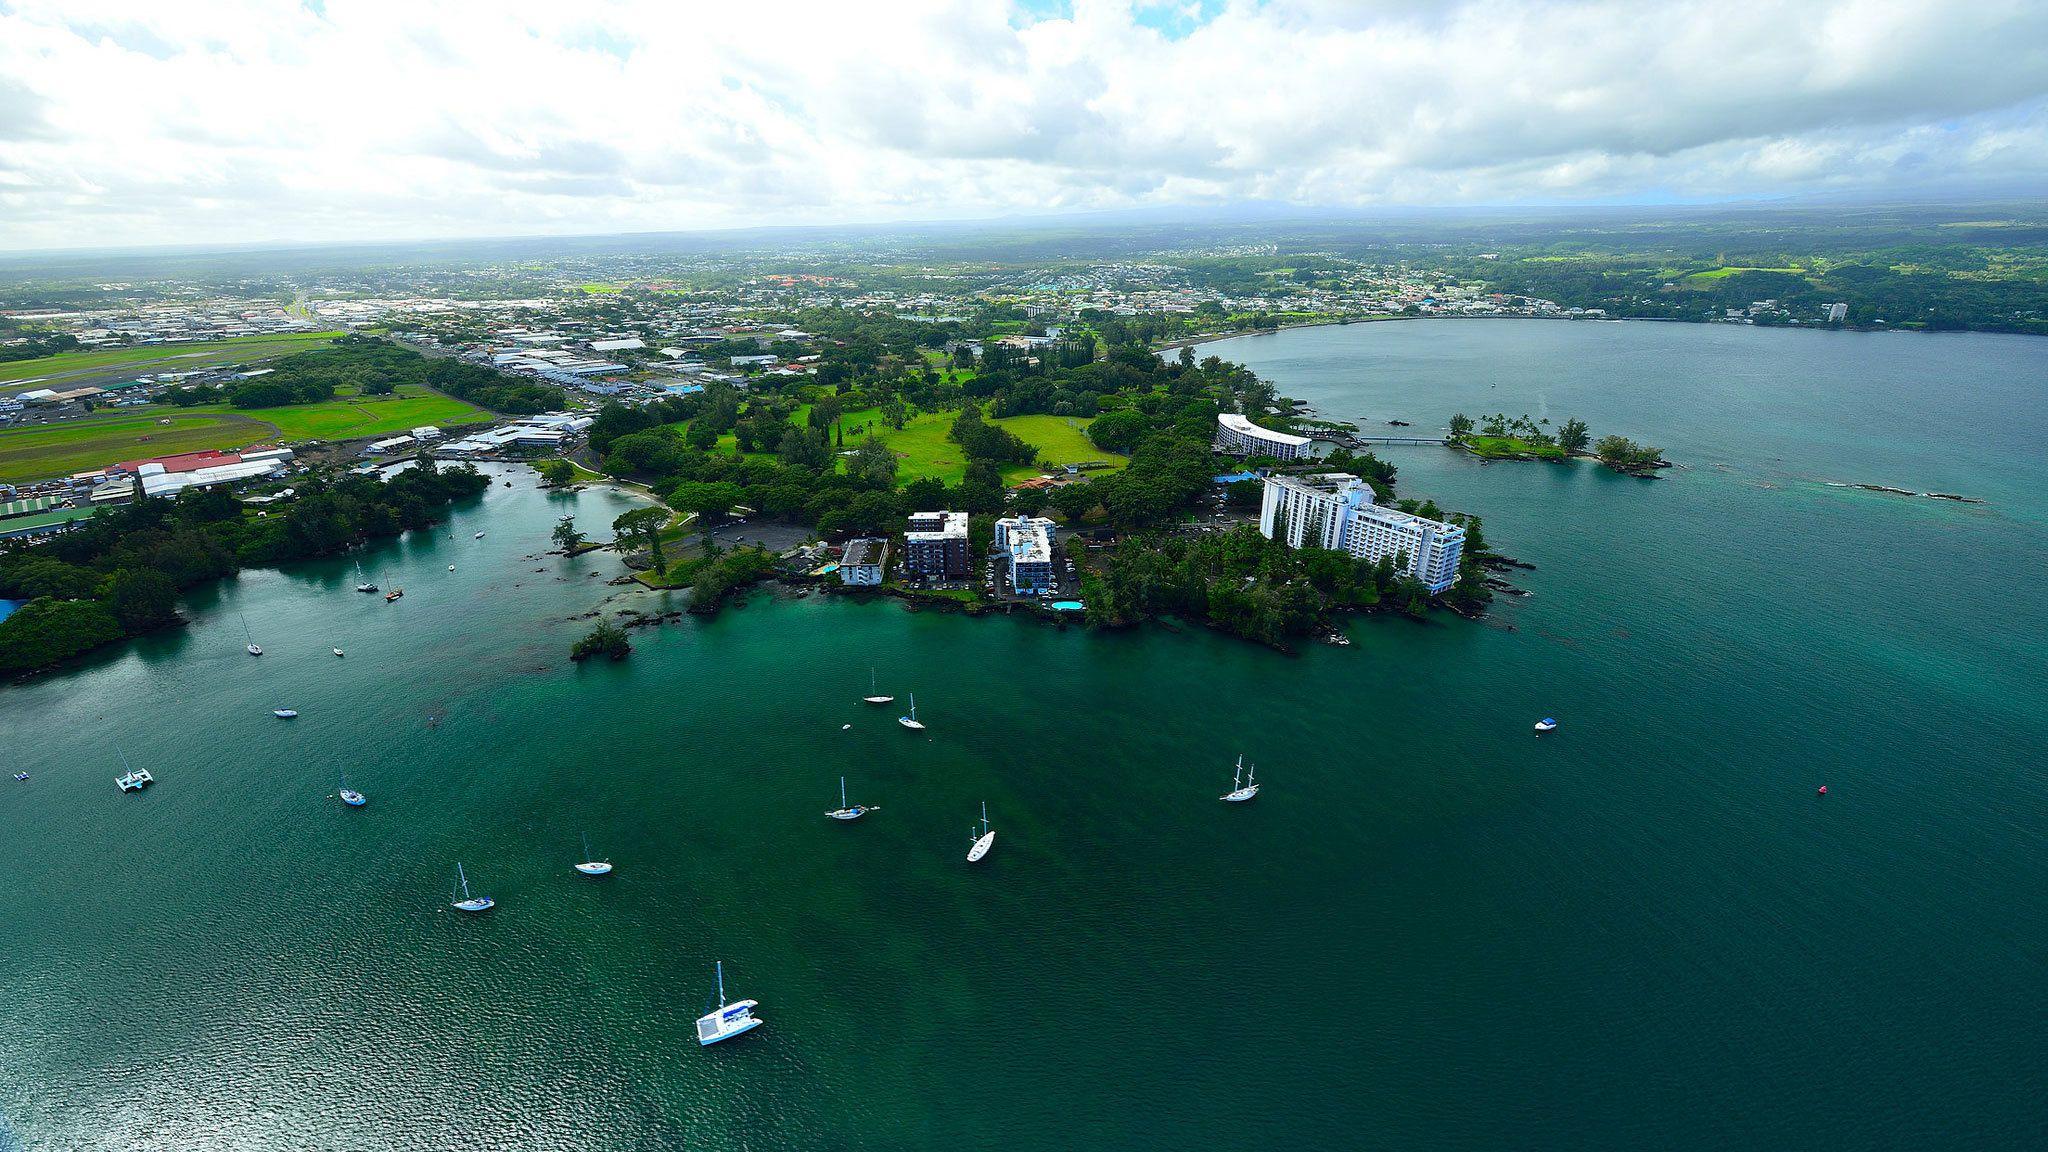 Aerial view of Big Island